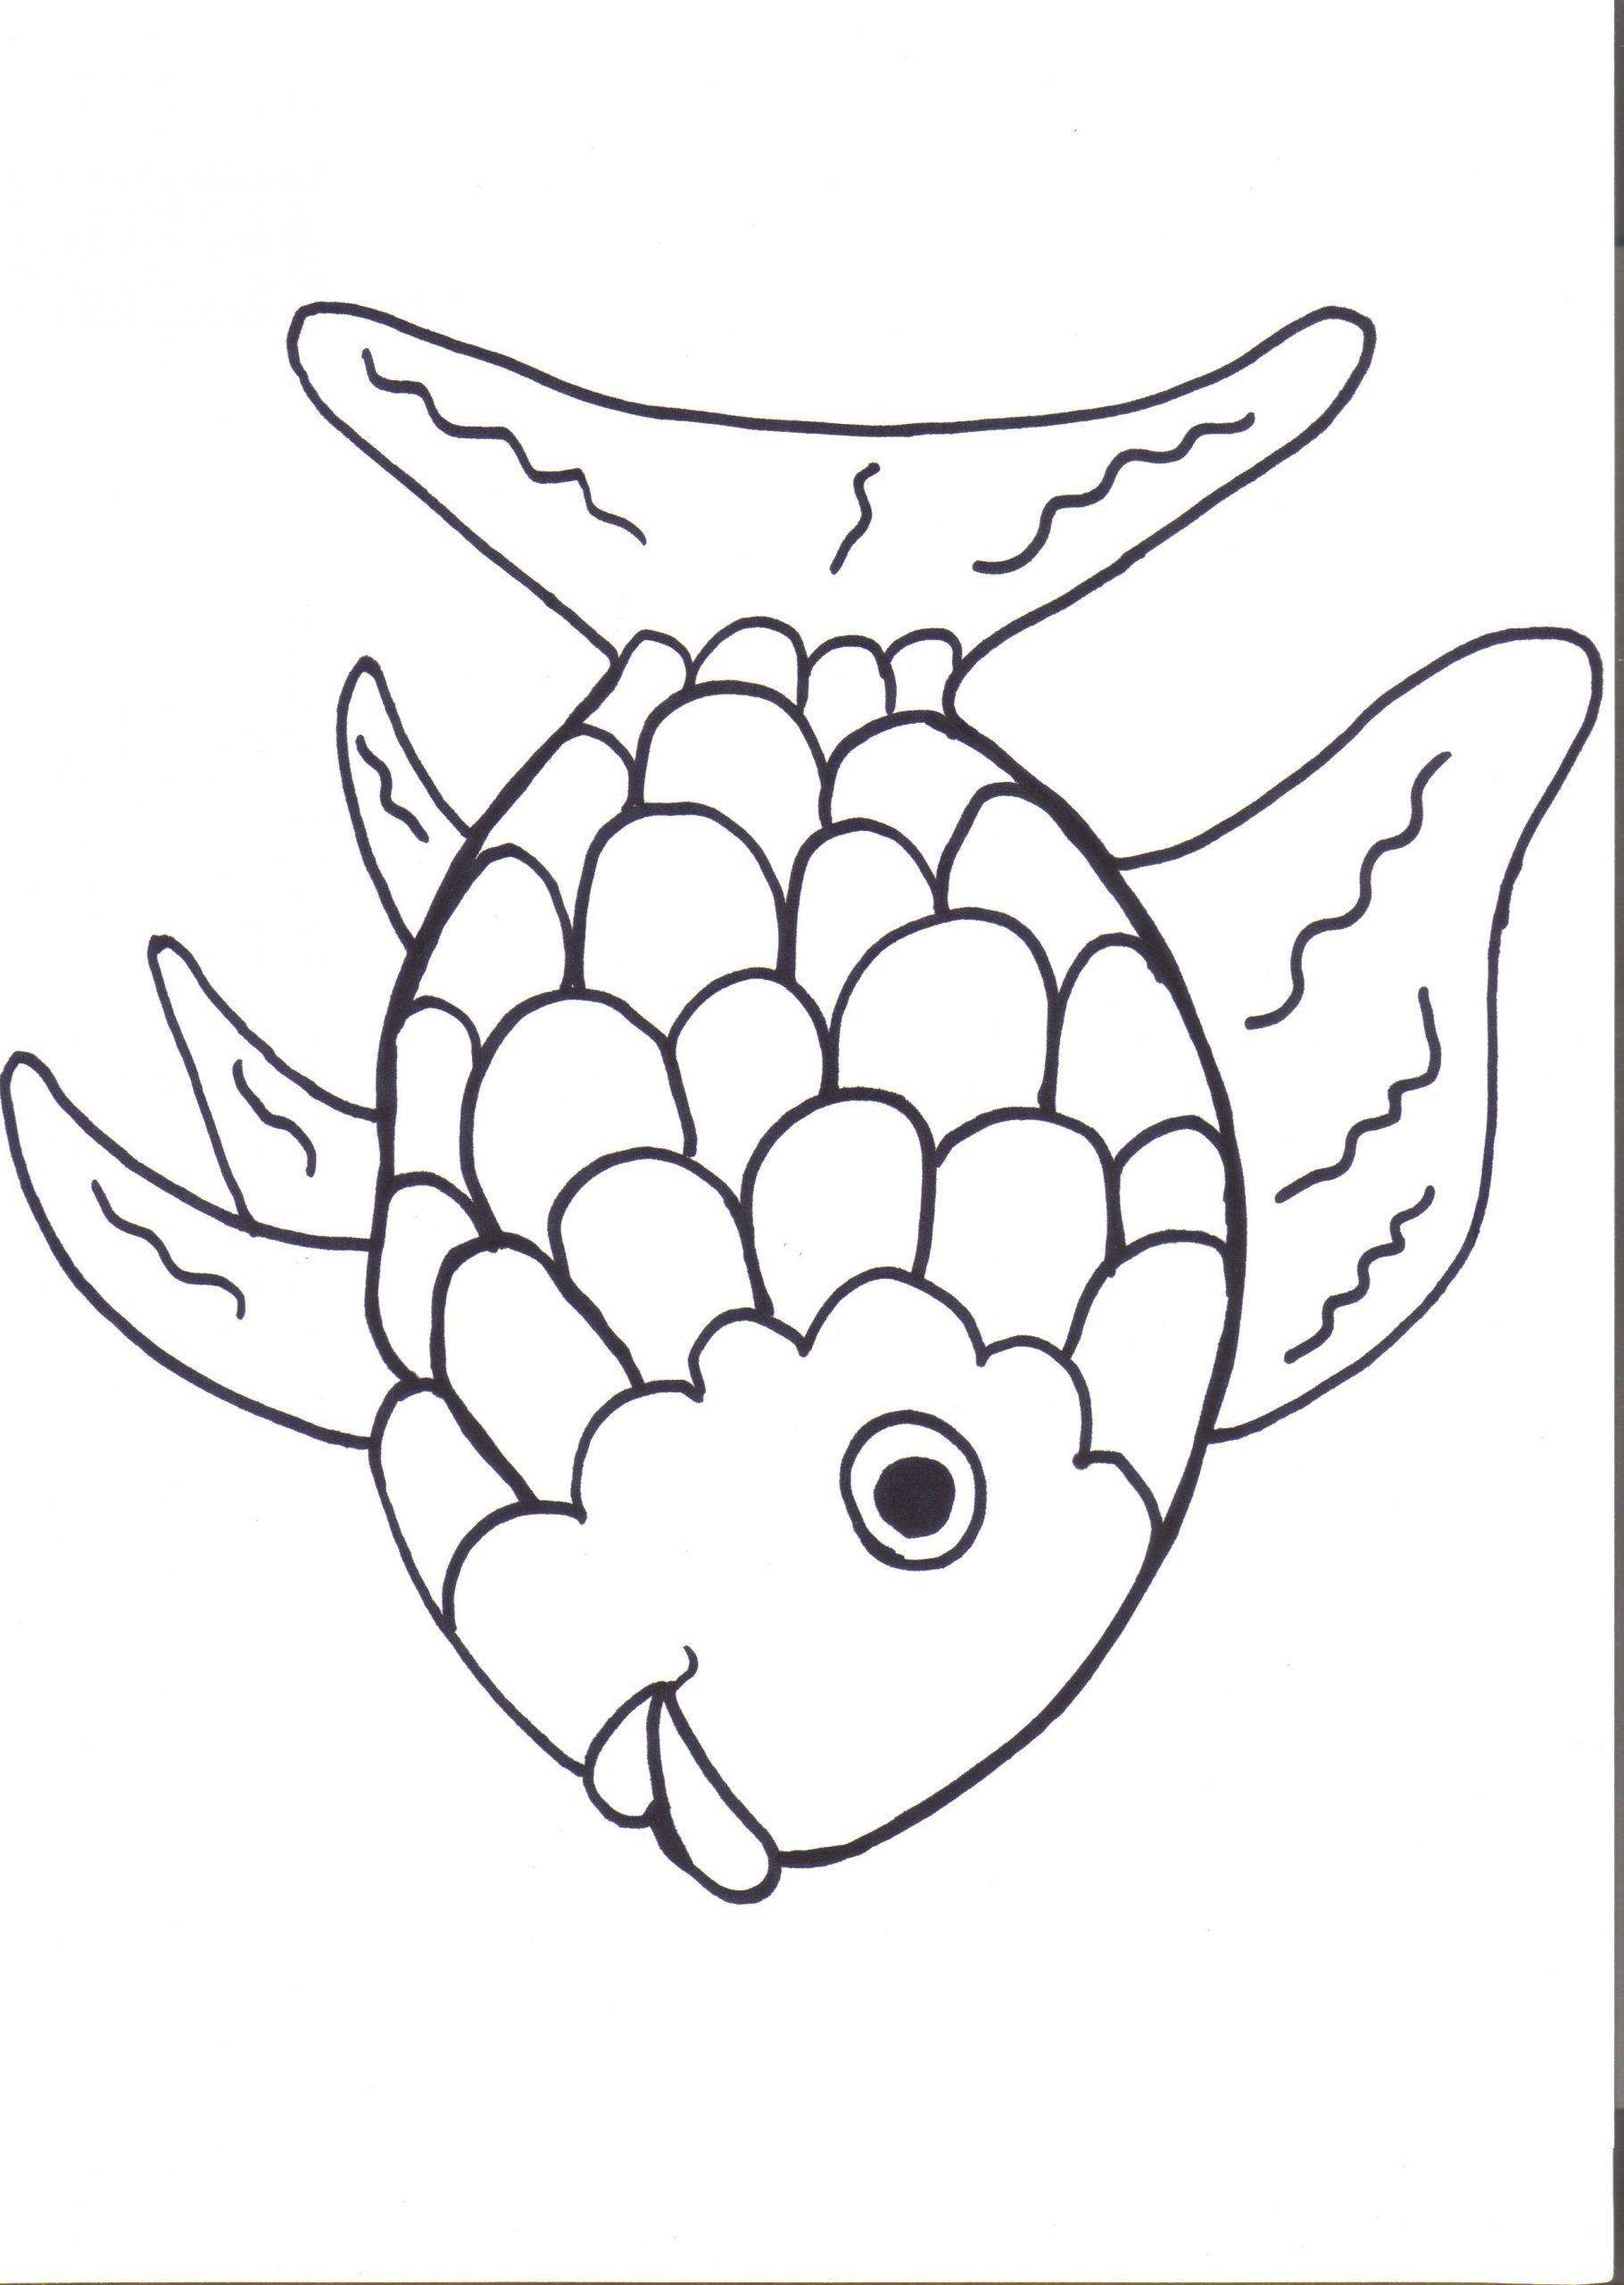 Rainbow Fish Printable Worksheets In